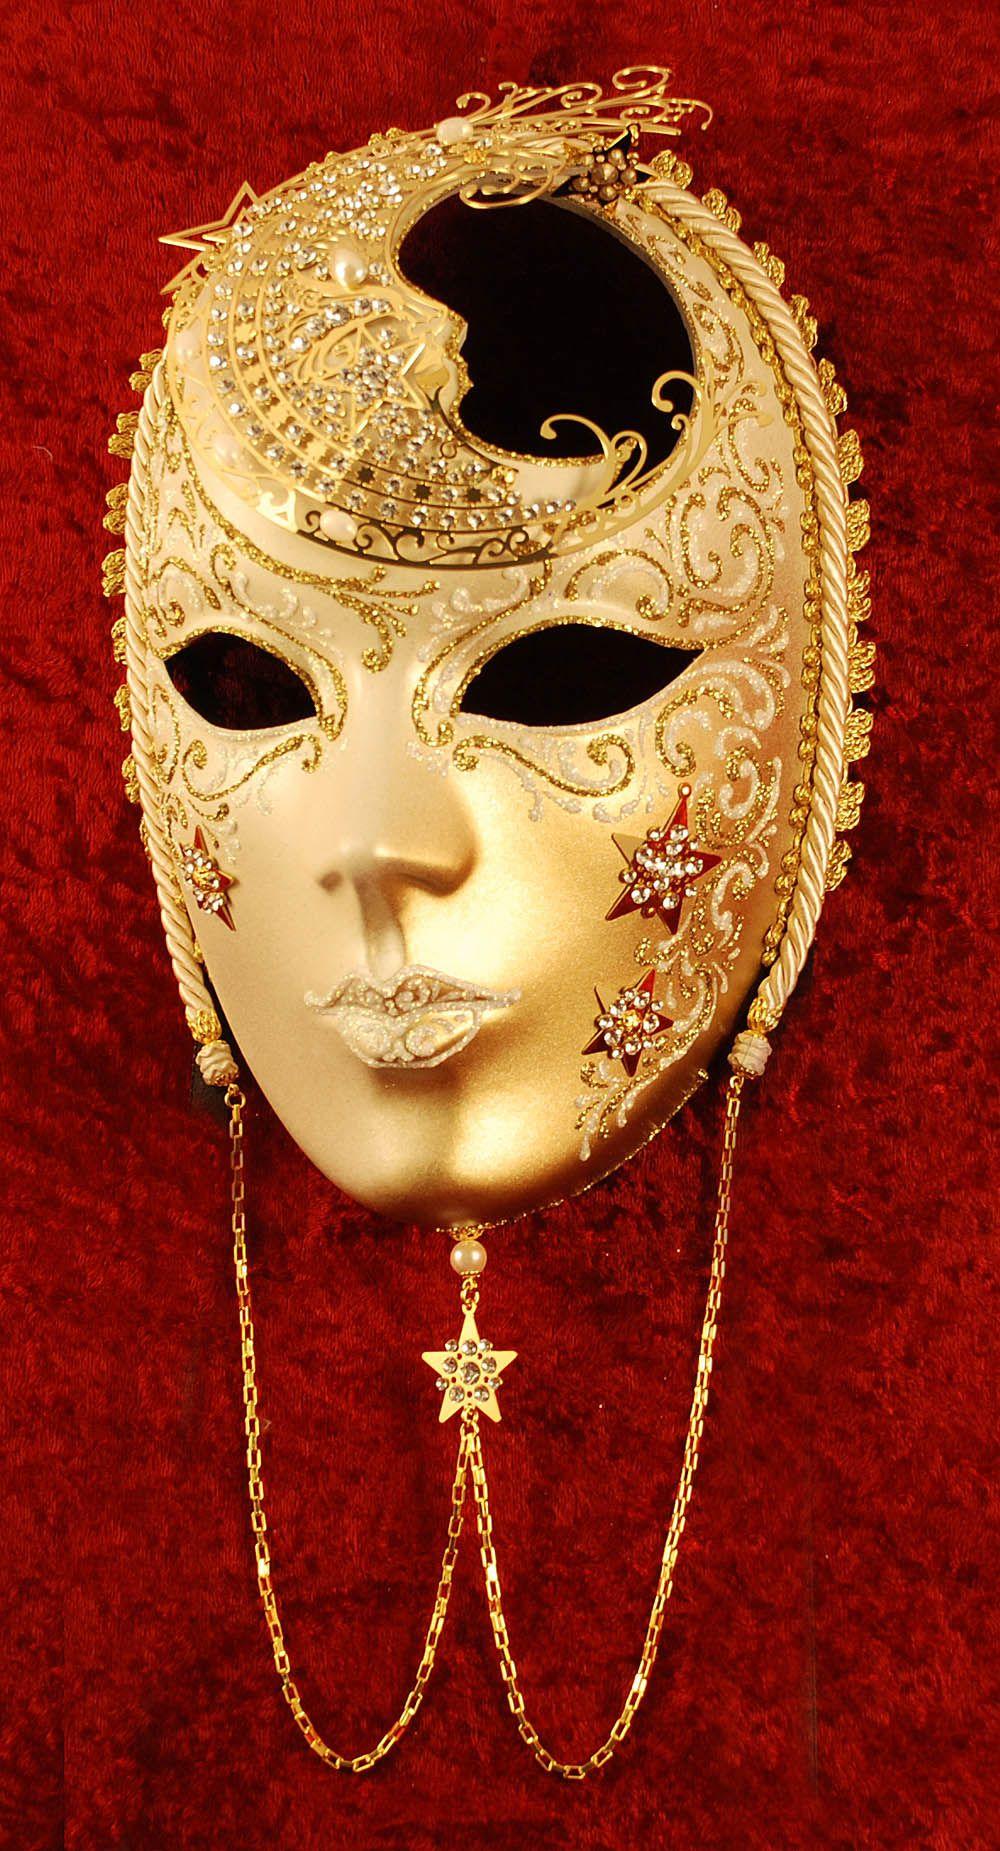 http://www.artedivenezia.ru/images2/it_1290033524.jpg | mask ...